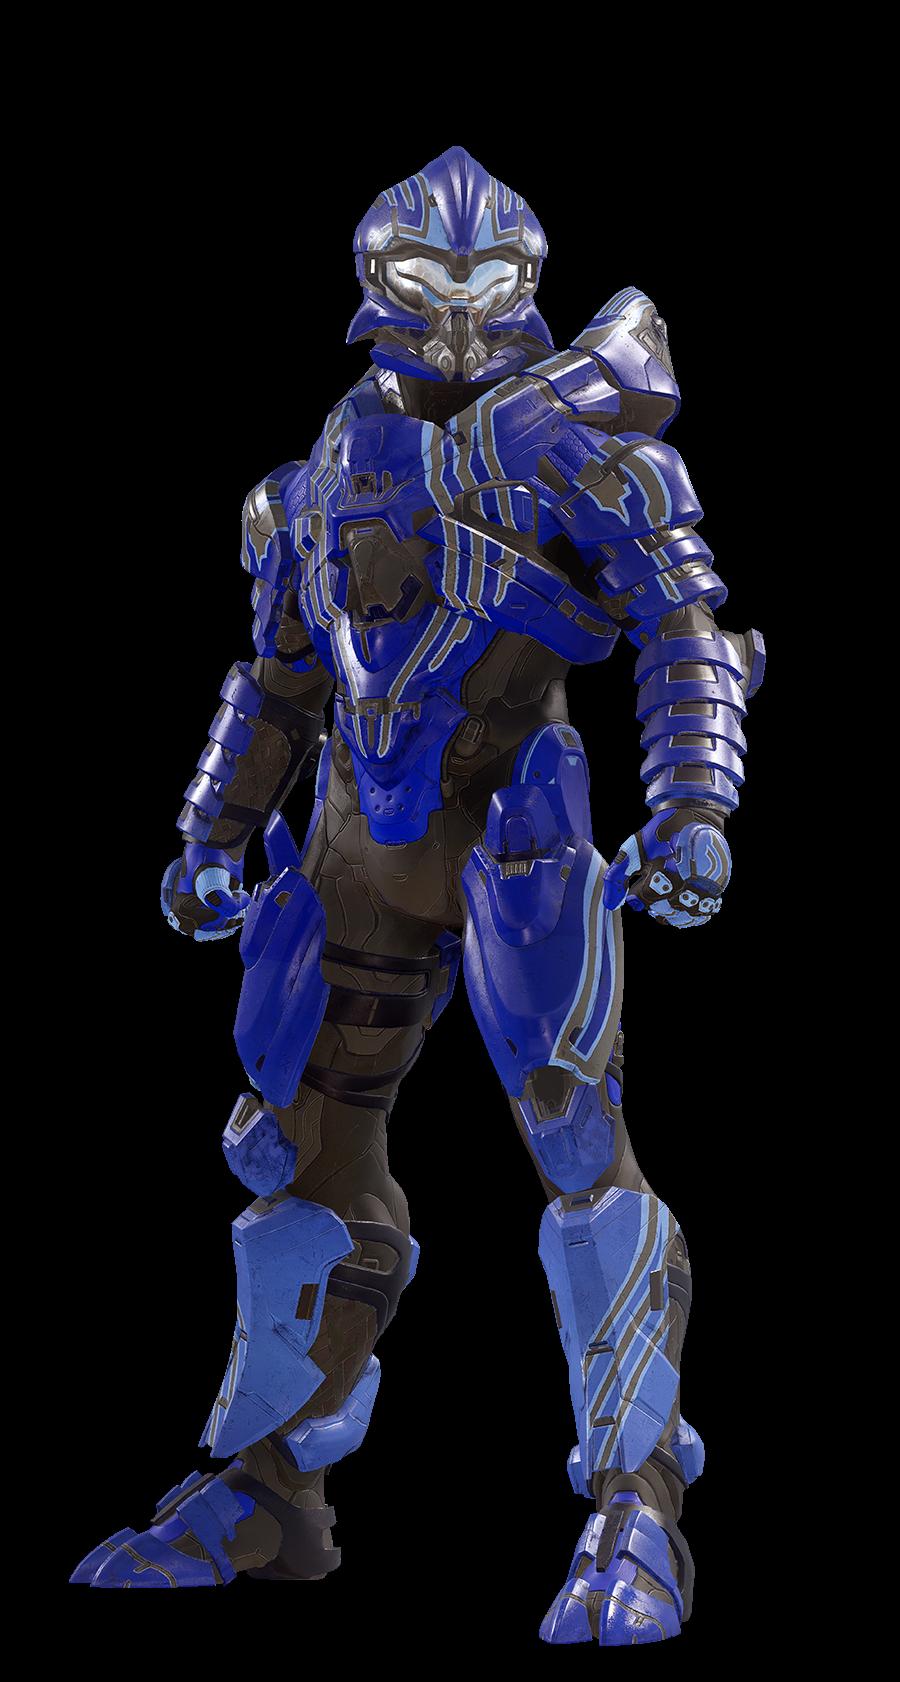 Armadura Potenciada de Asalto MJOLNIR/Variante Helioskrill